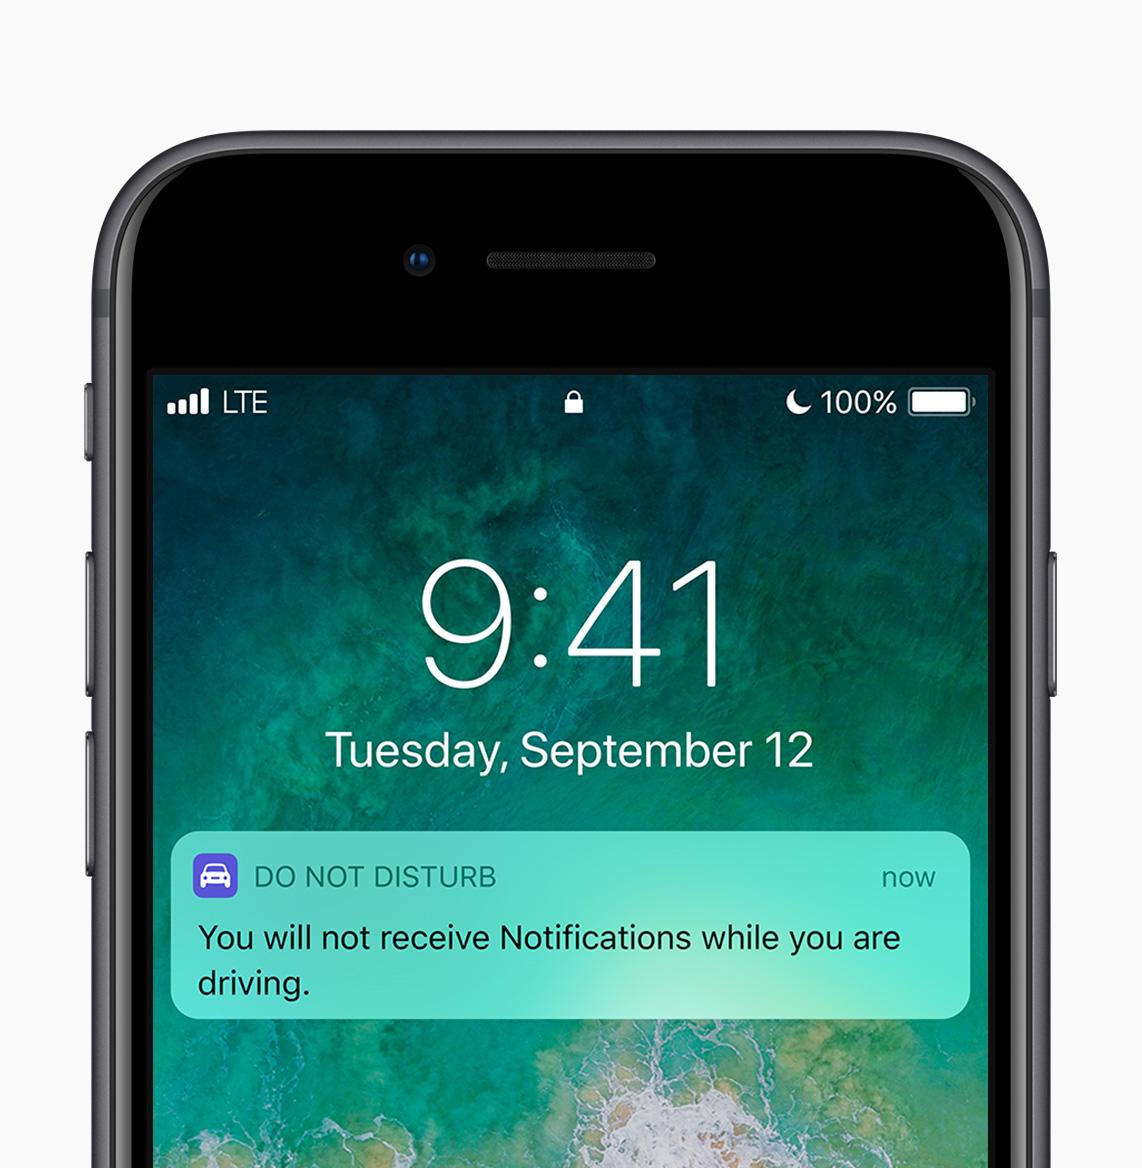 iOS 11 Do Not Disturb